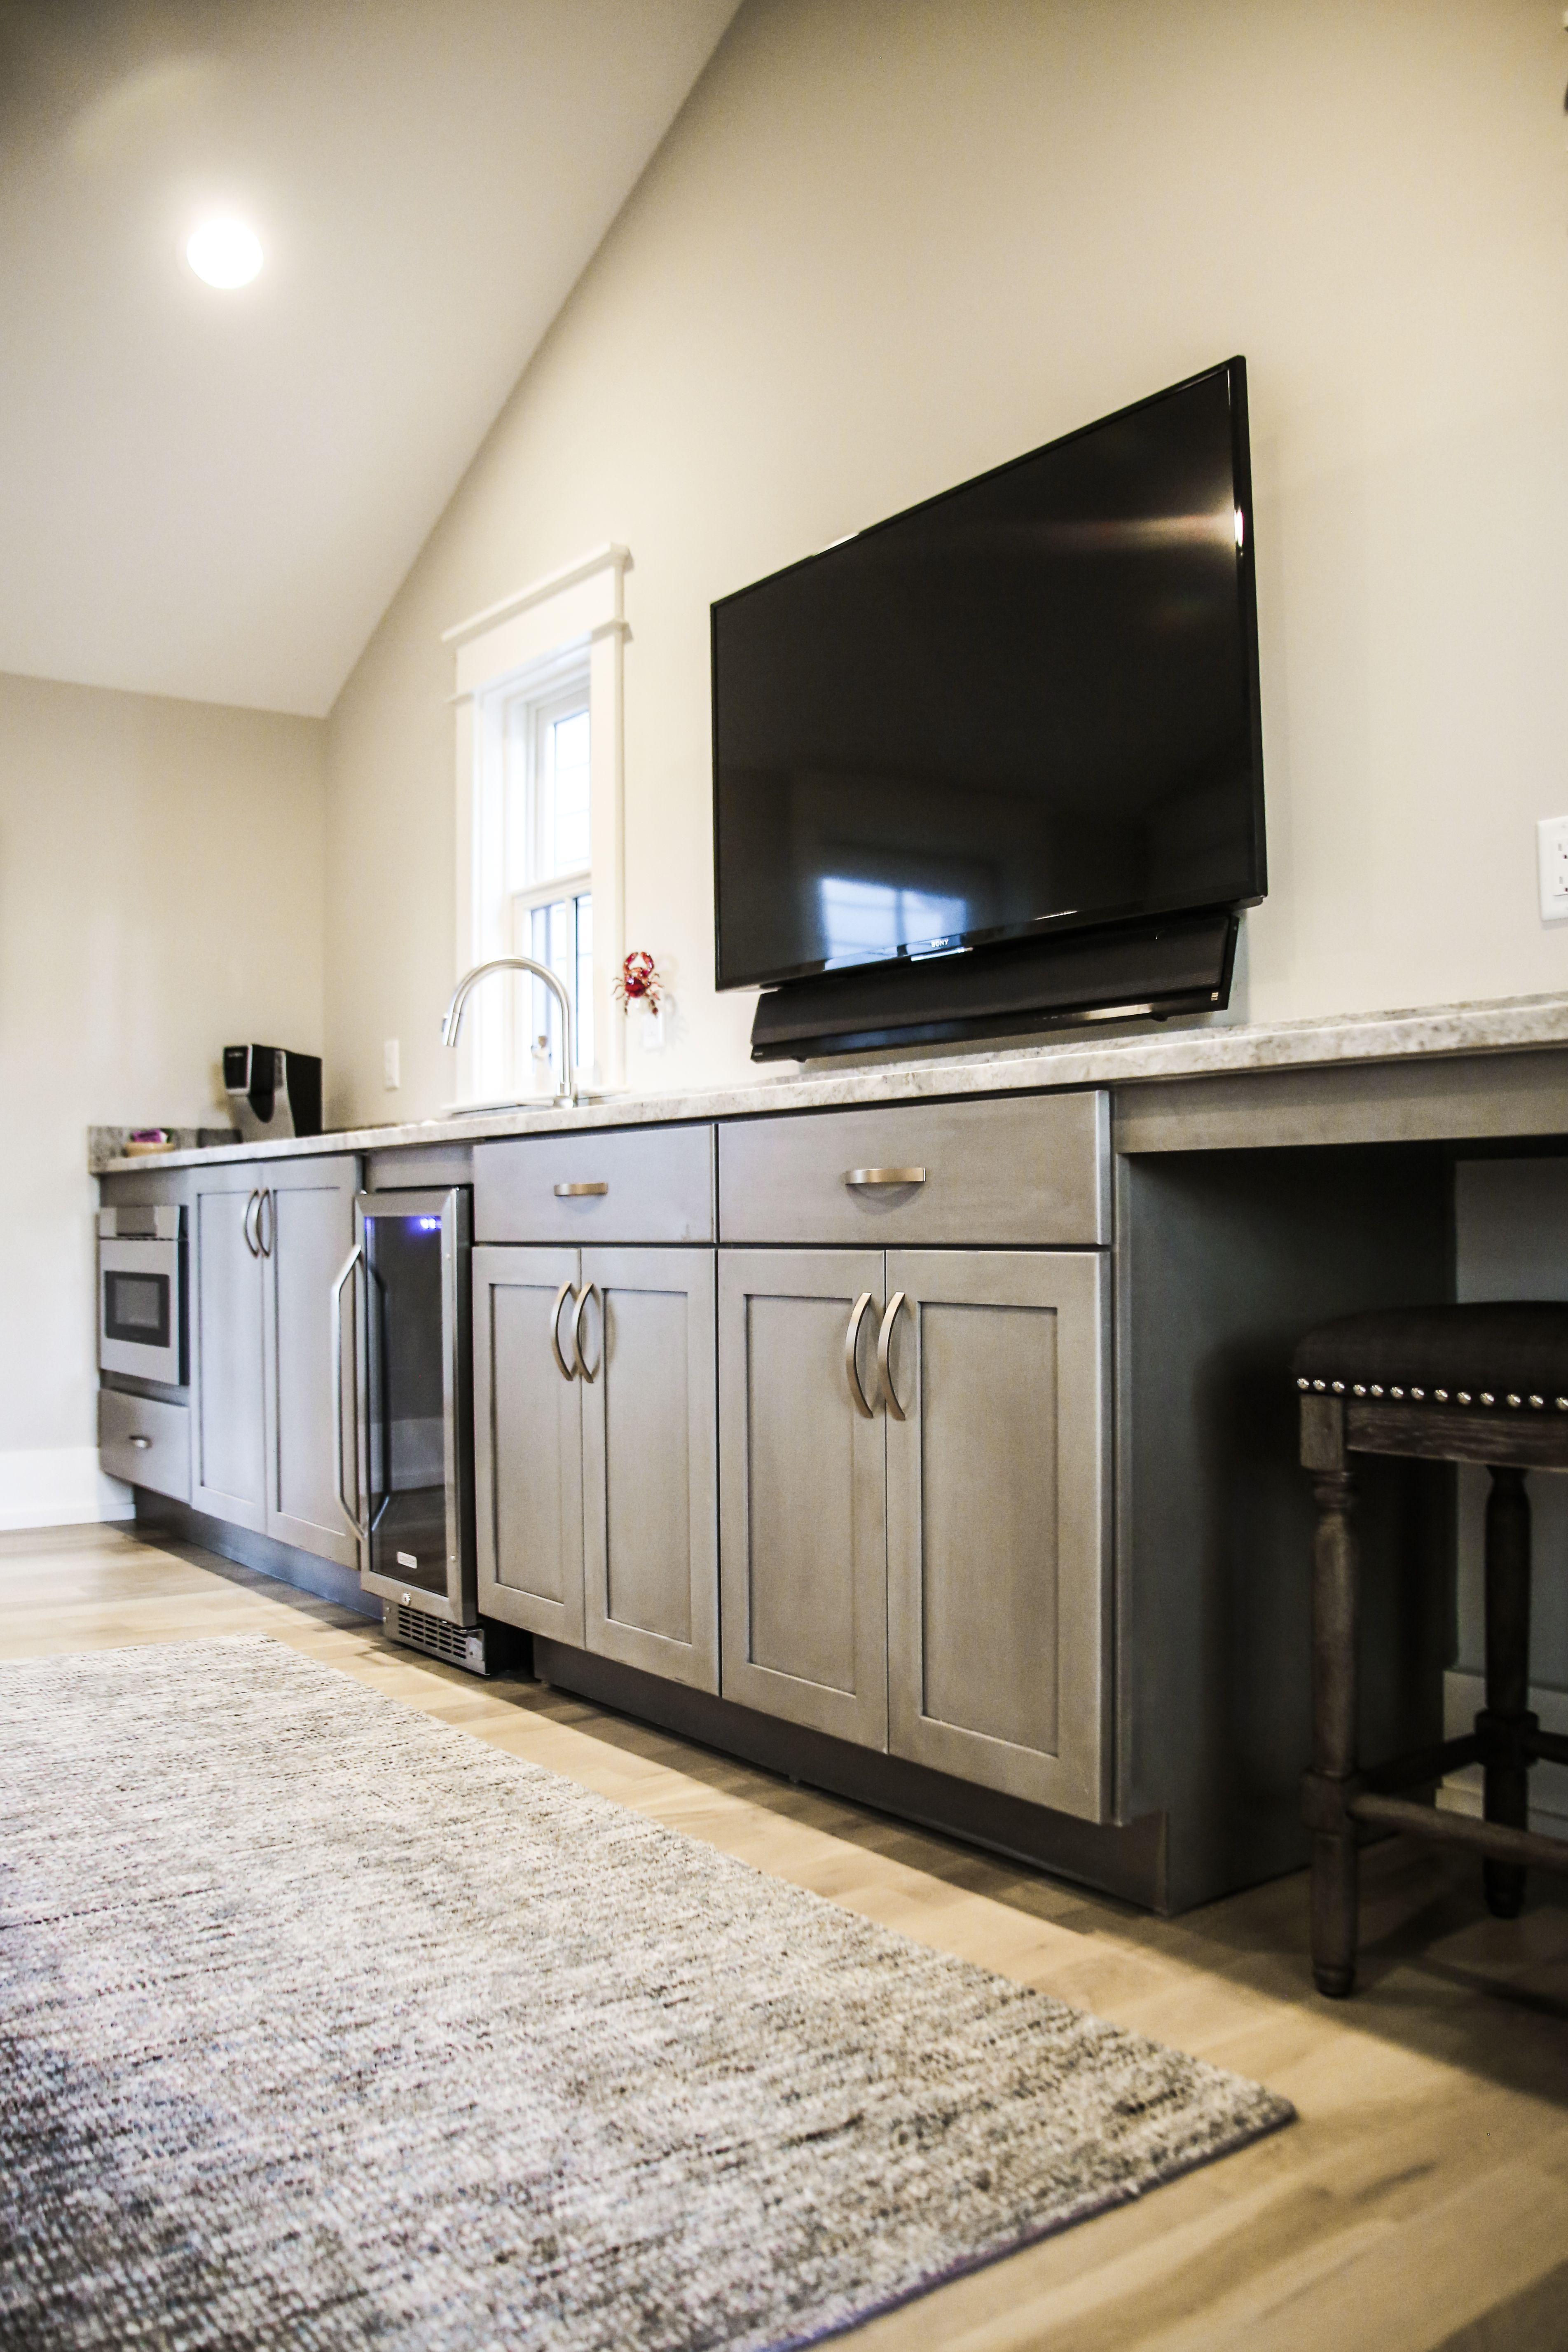 Bonus Room With Bar And Tv Dream Home Kitchen Cabinets Panel Wood Decor Interior De Interior Design Kitchen Kitchen Interior Home Design Living Room